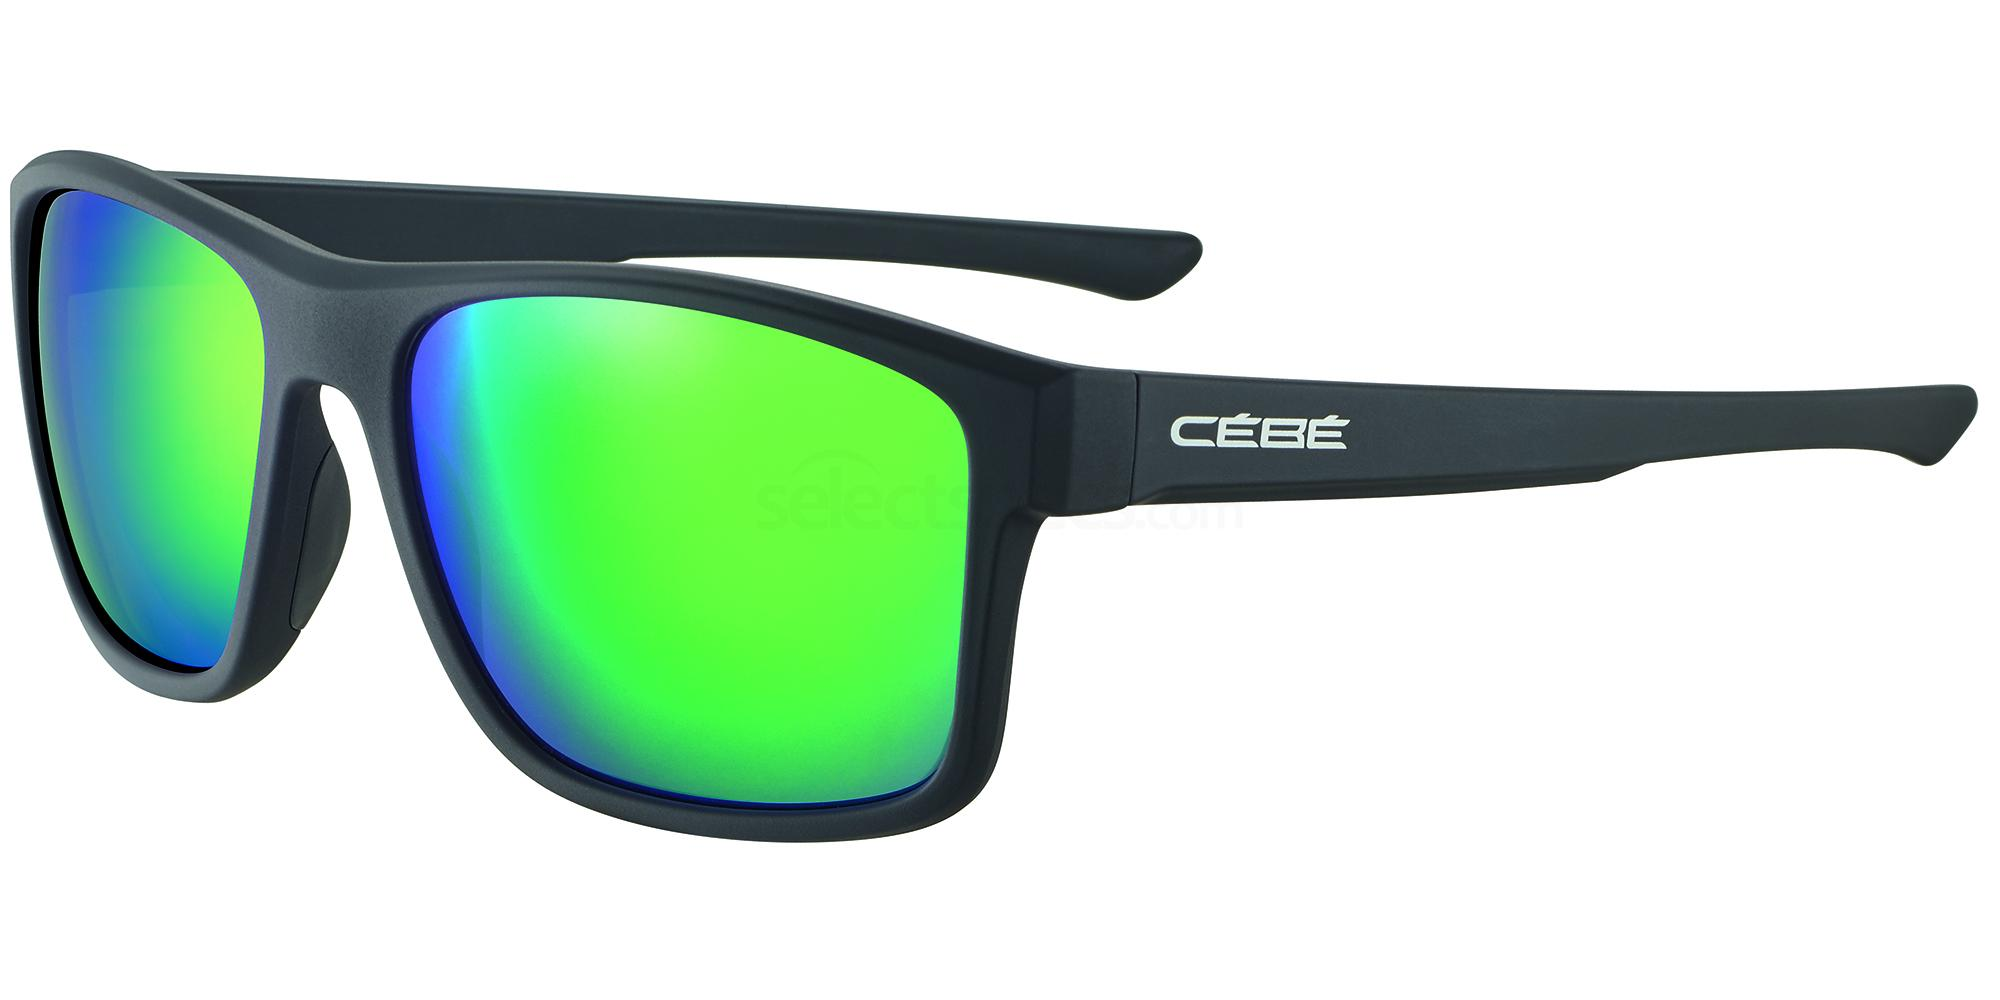 CBS034 BAXTER Sunglasses, Cebe